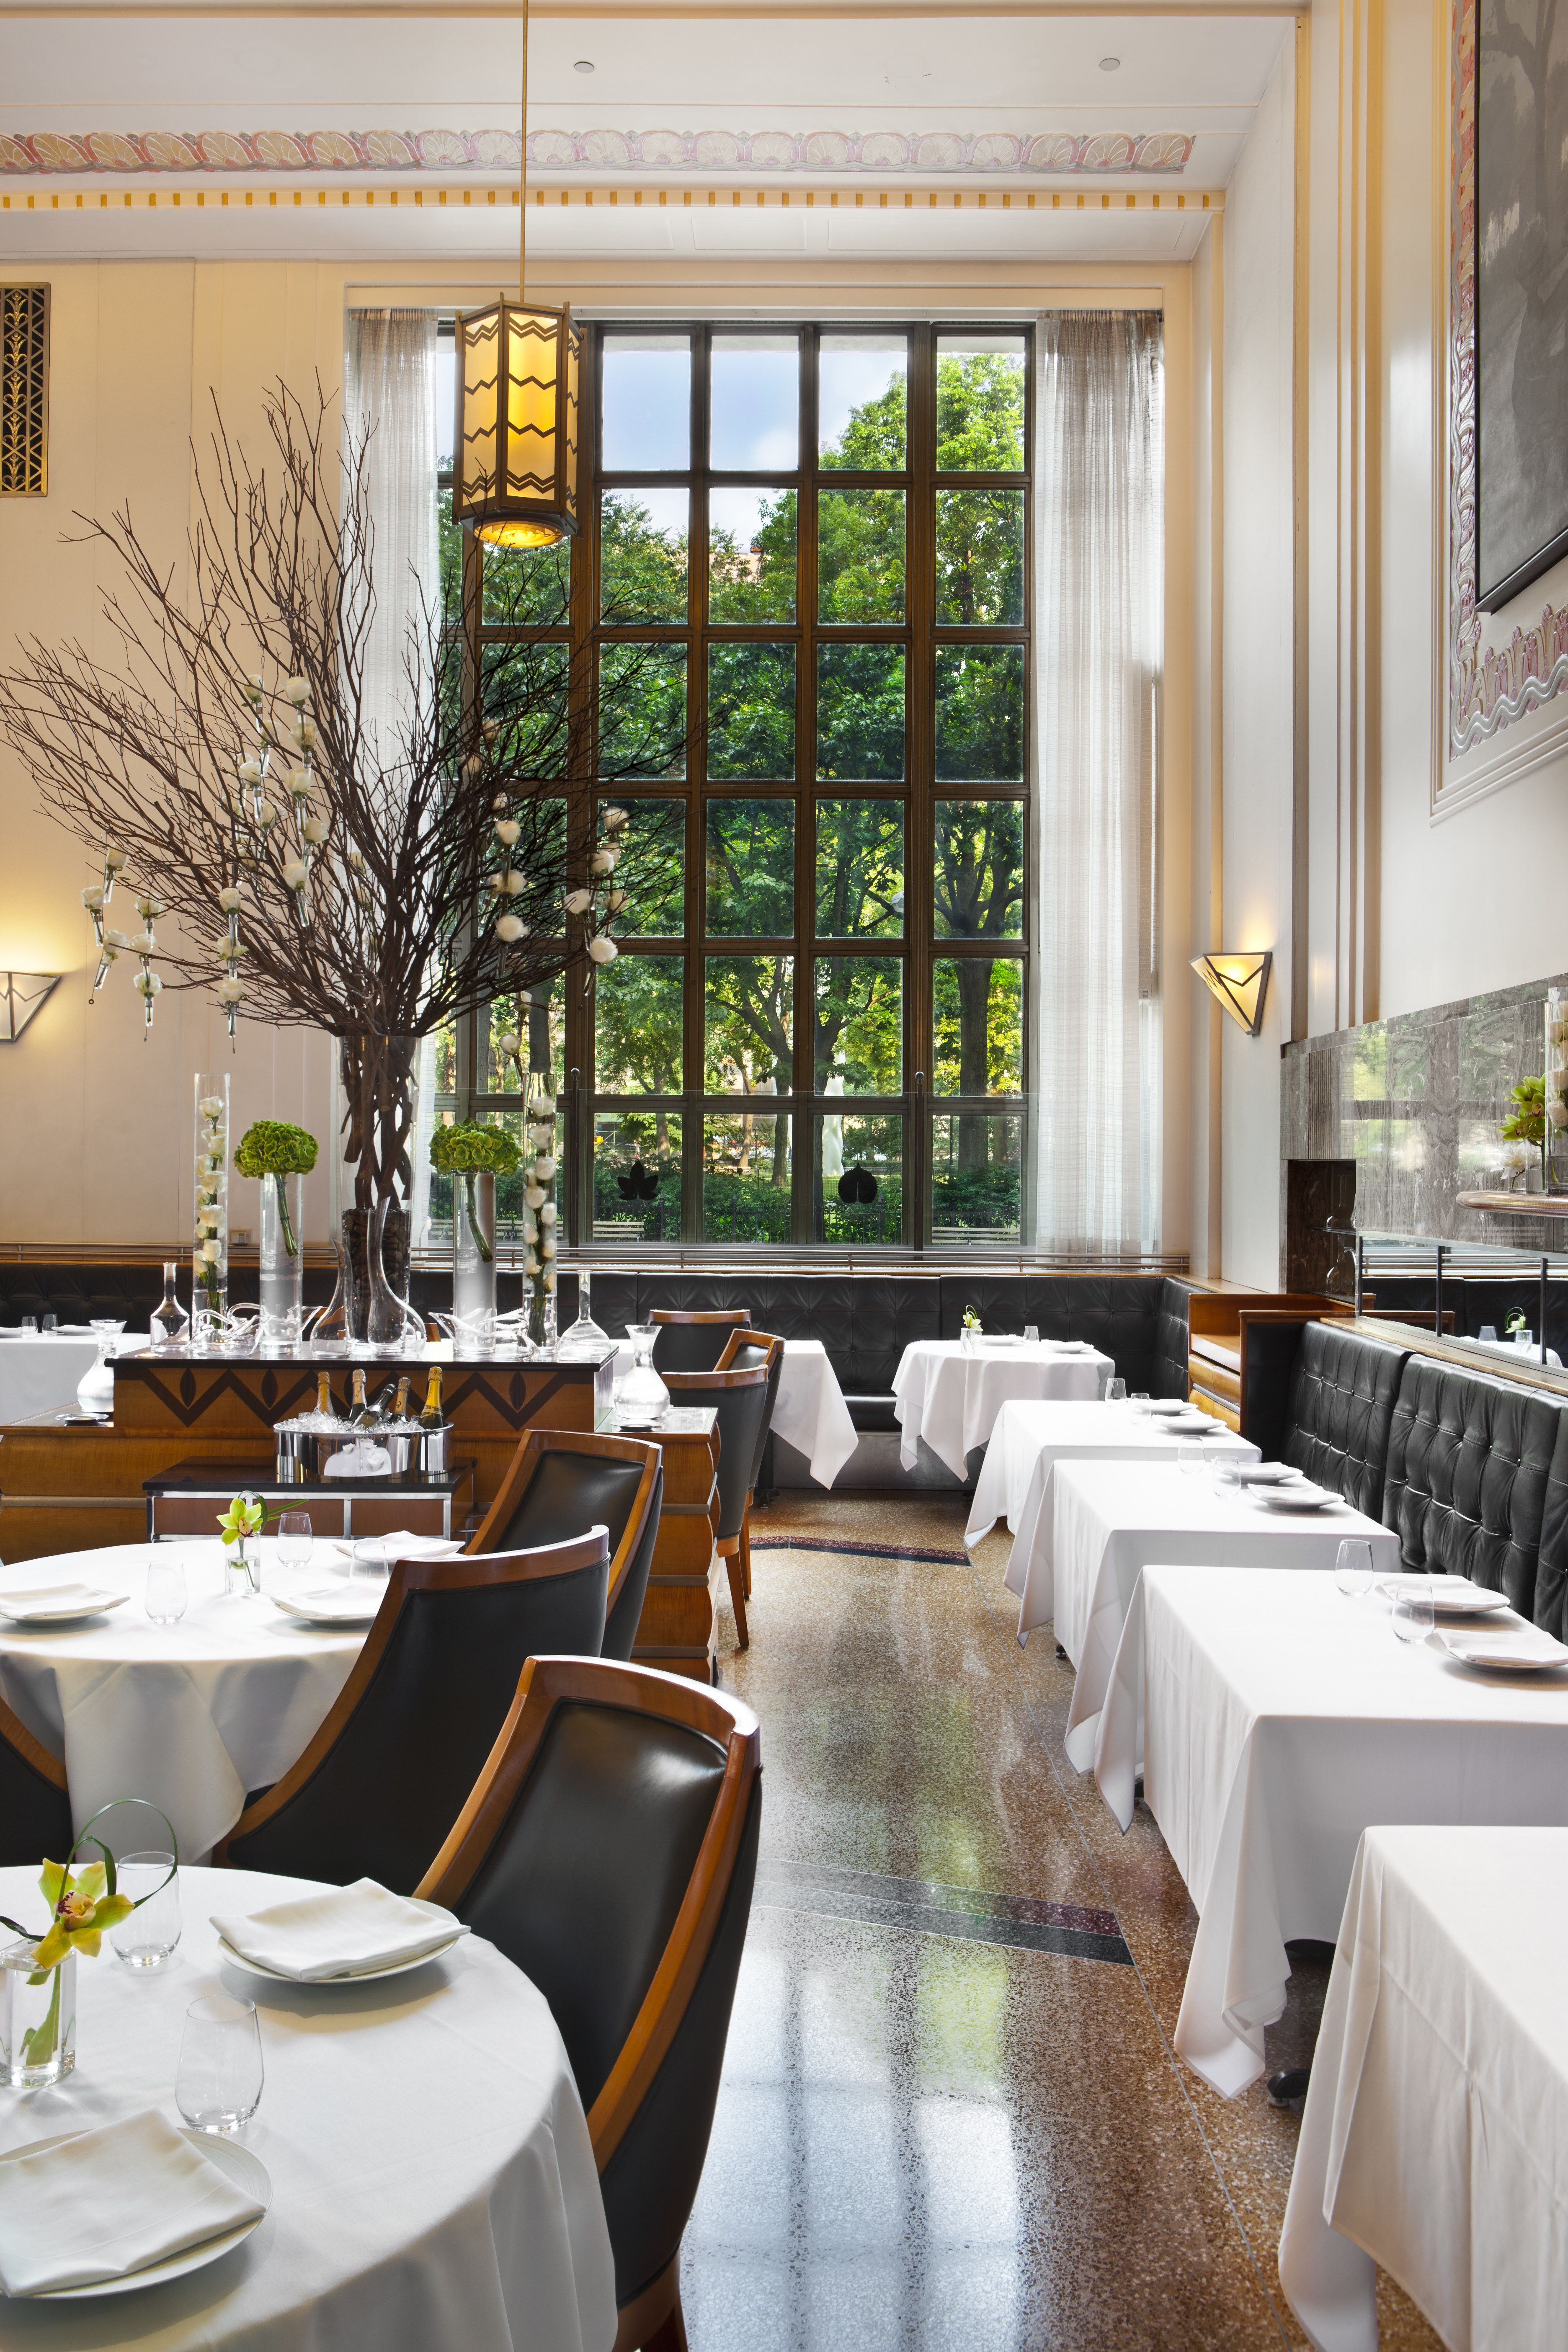 The 12 Most Stylish Restaurants in New York City